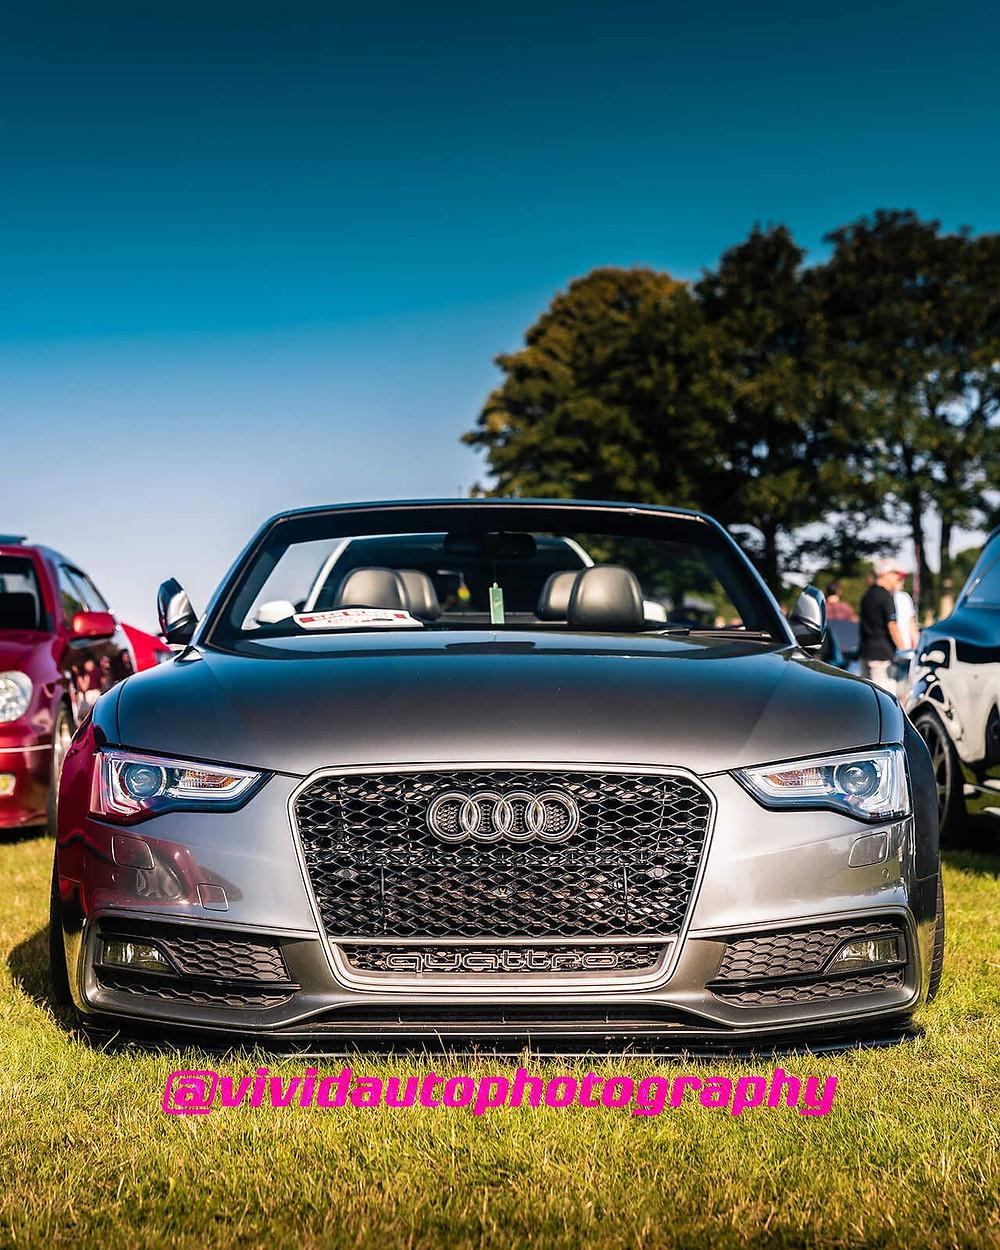 Audi A5 Convertible | North Staffs Customs Car Club | Daytona Grey